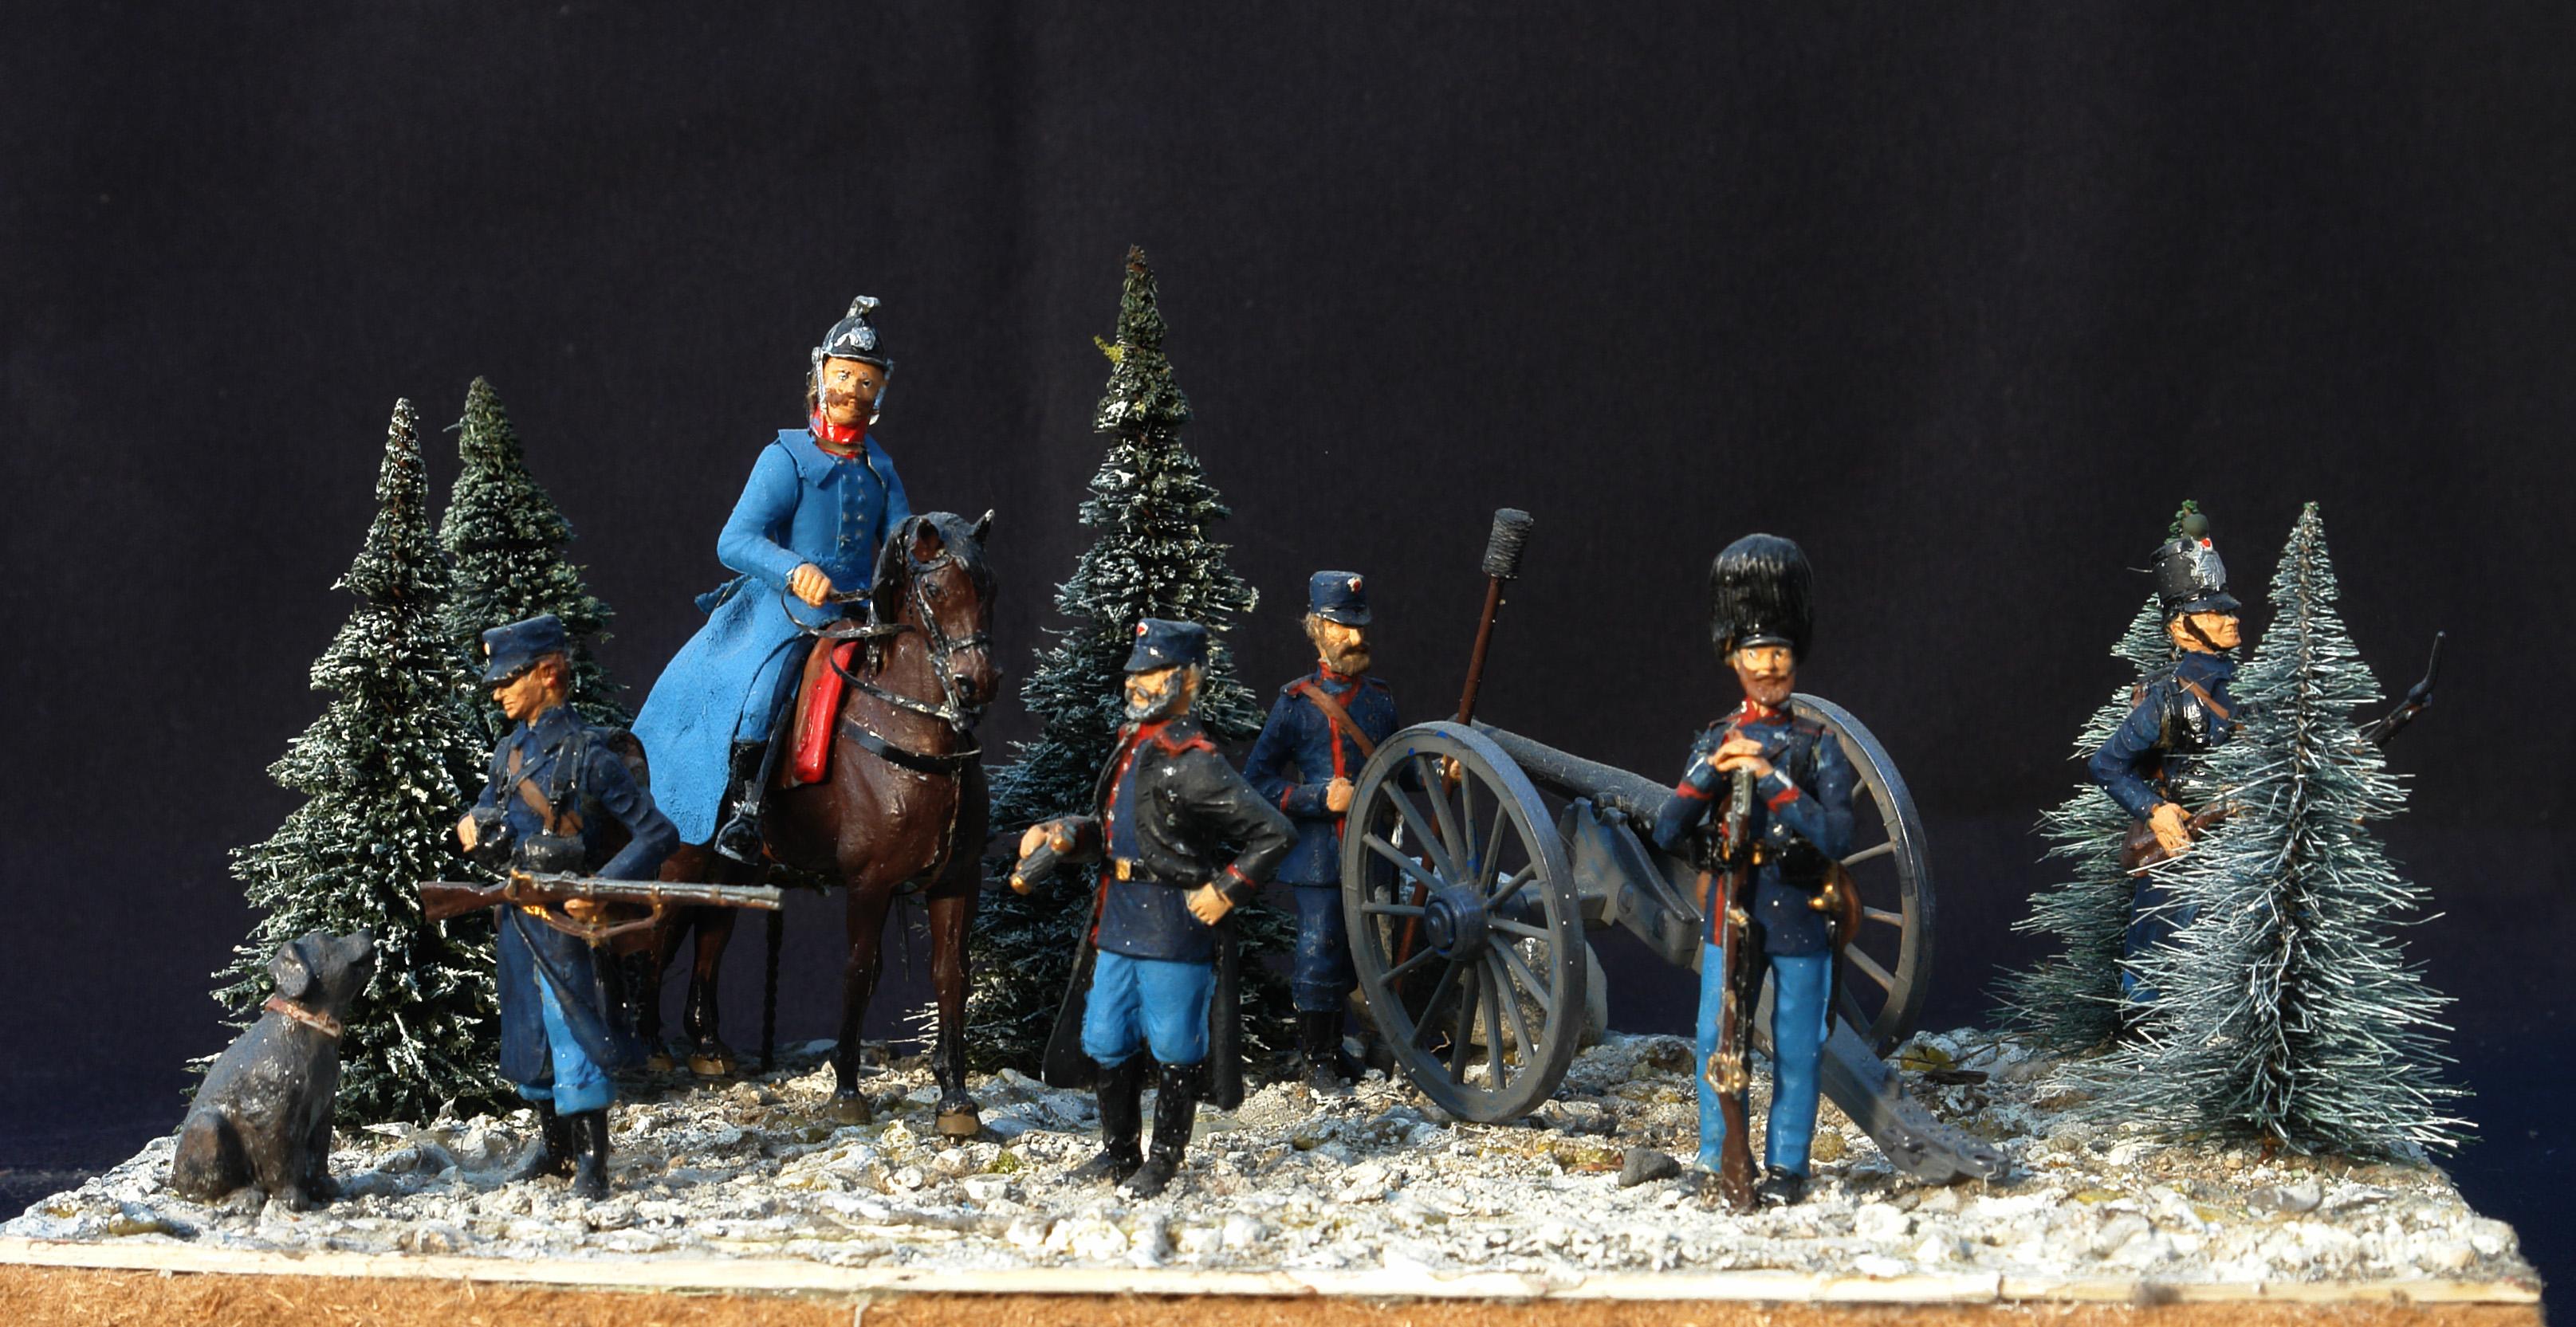 1864-Danske-soldater